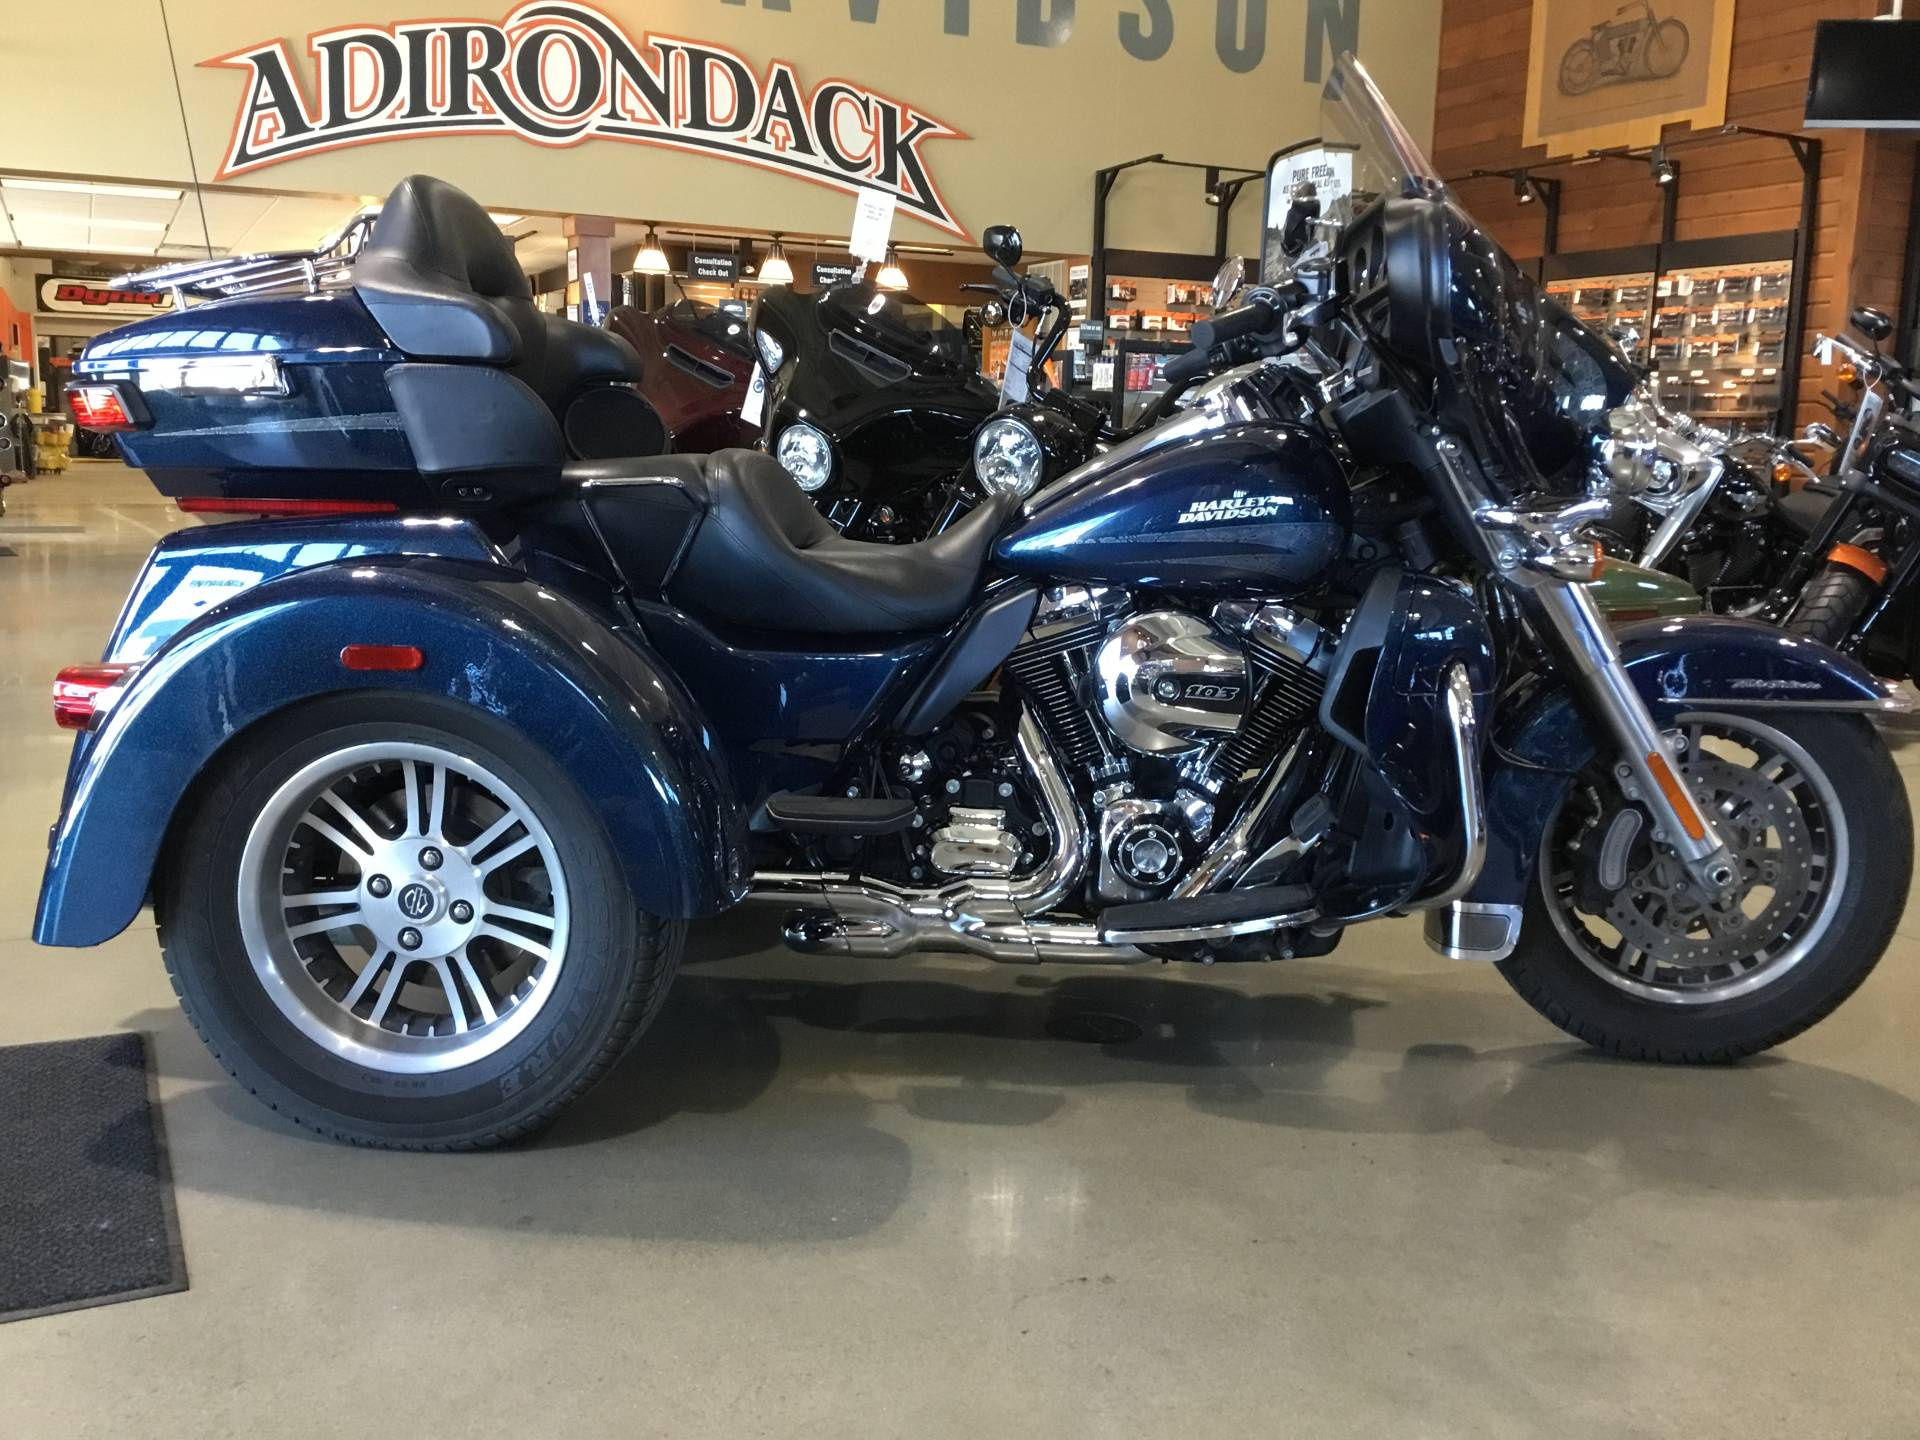 2016 Harley Davidson Tri Glide Trike Three Wheeler For: 2016 Harley-Davidson Tri Glide® Ultra Trikes Broadalbin